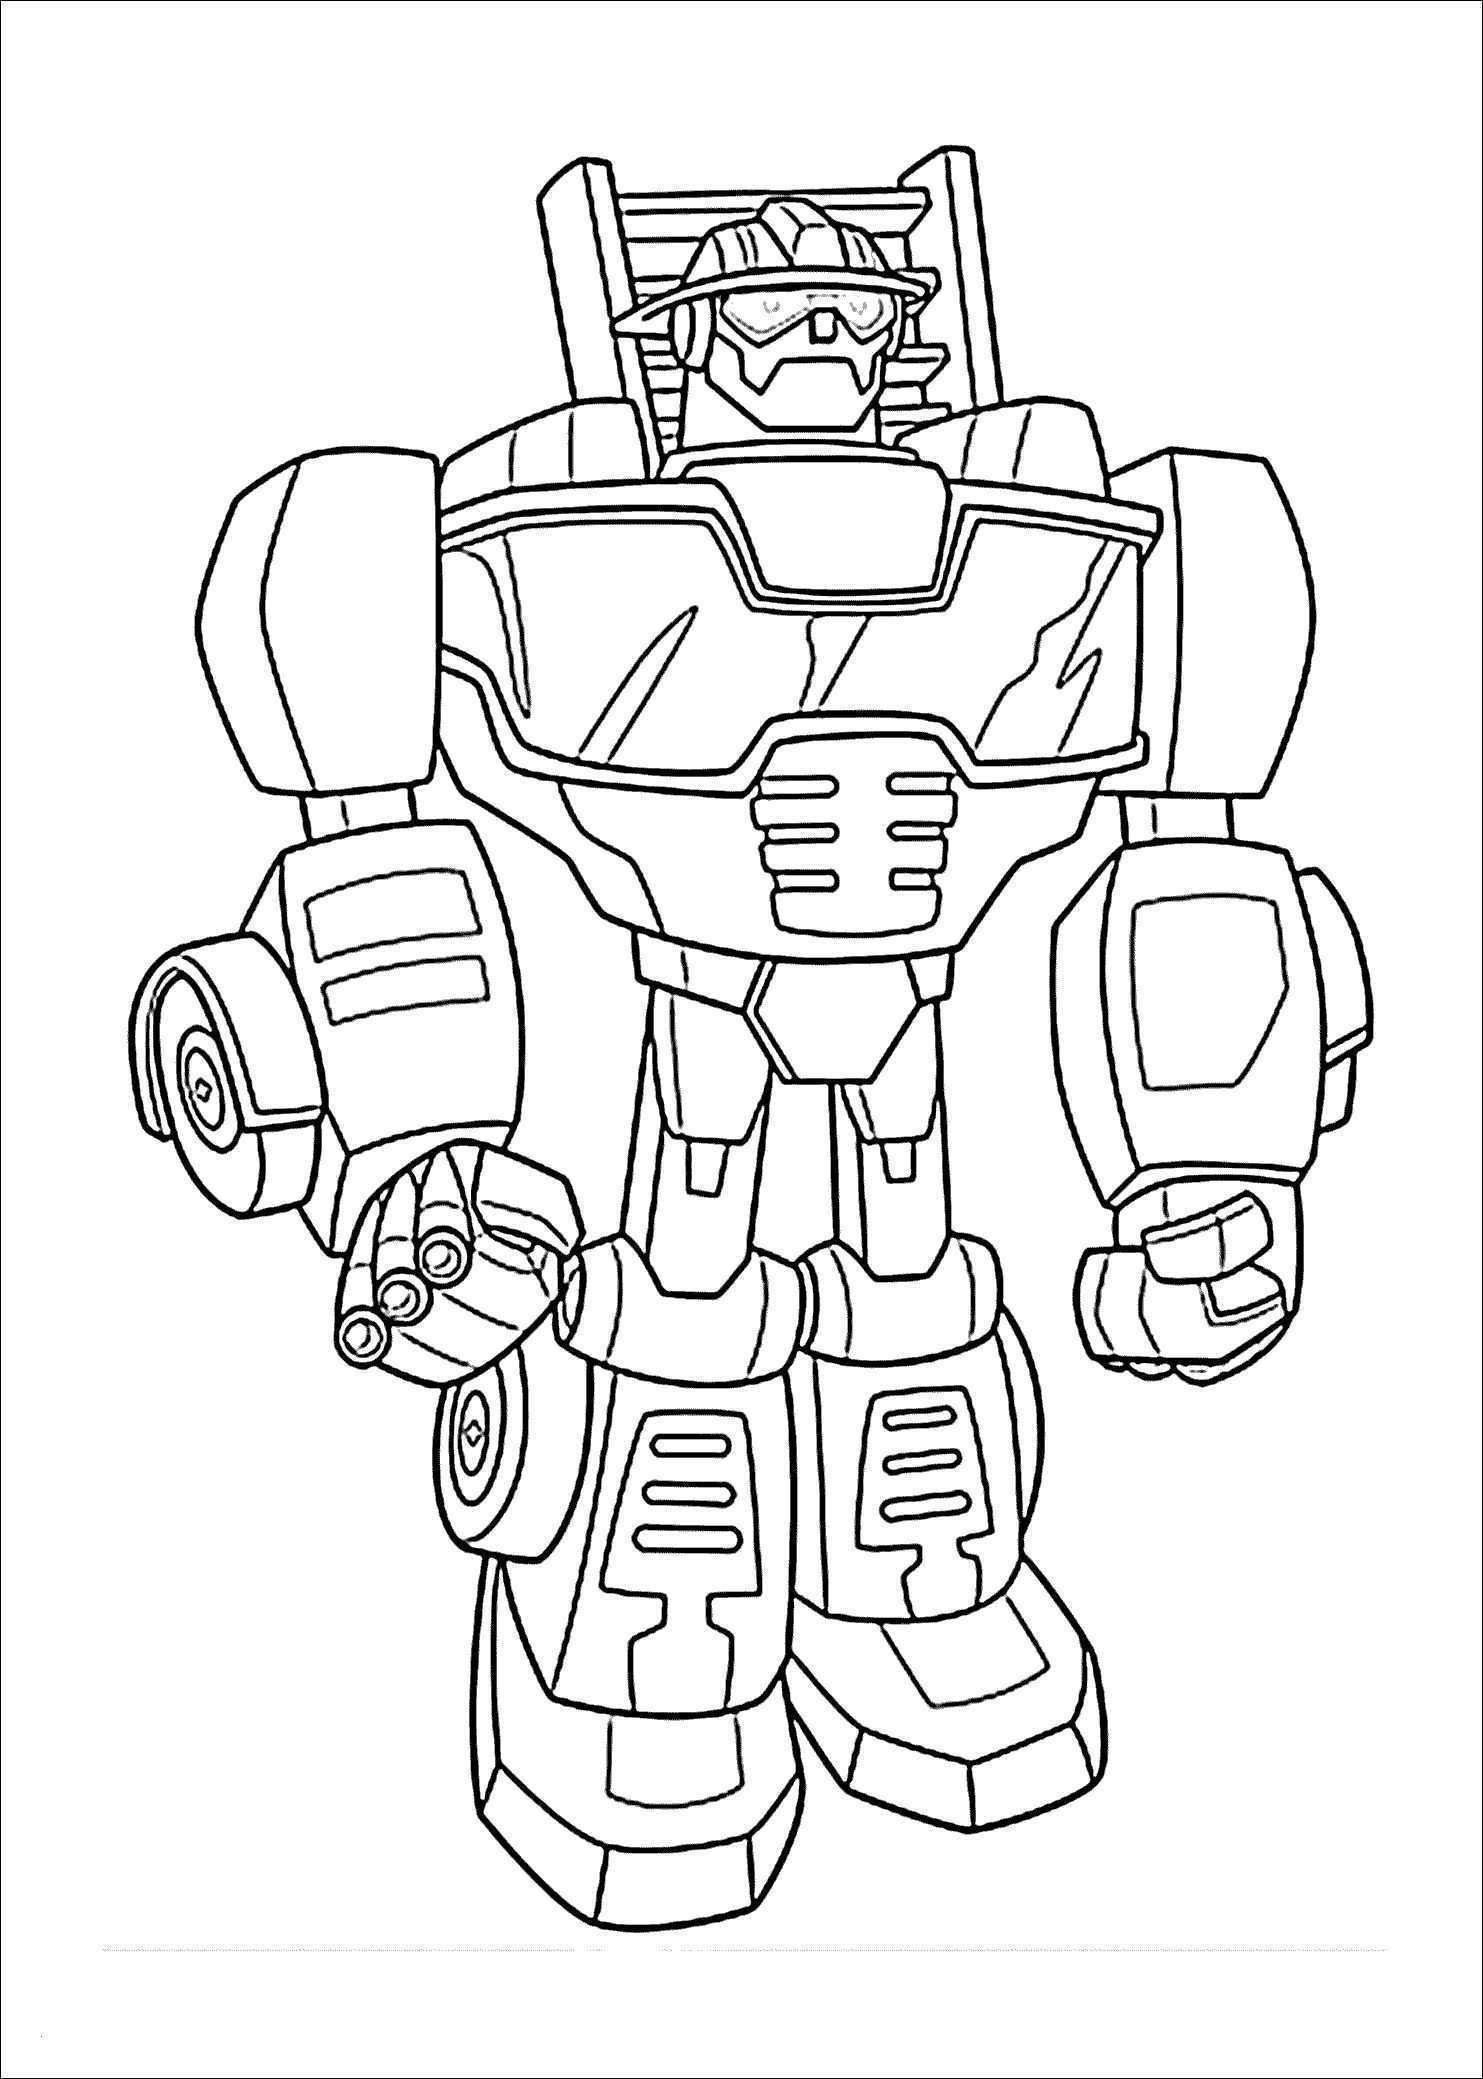 Rescue Bots Ausmalbilder Einzigartig Ausmalbilder Transformers Optimus Prime Fotos Chase Bot Coloring Fotos